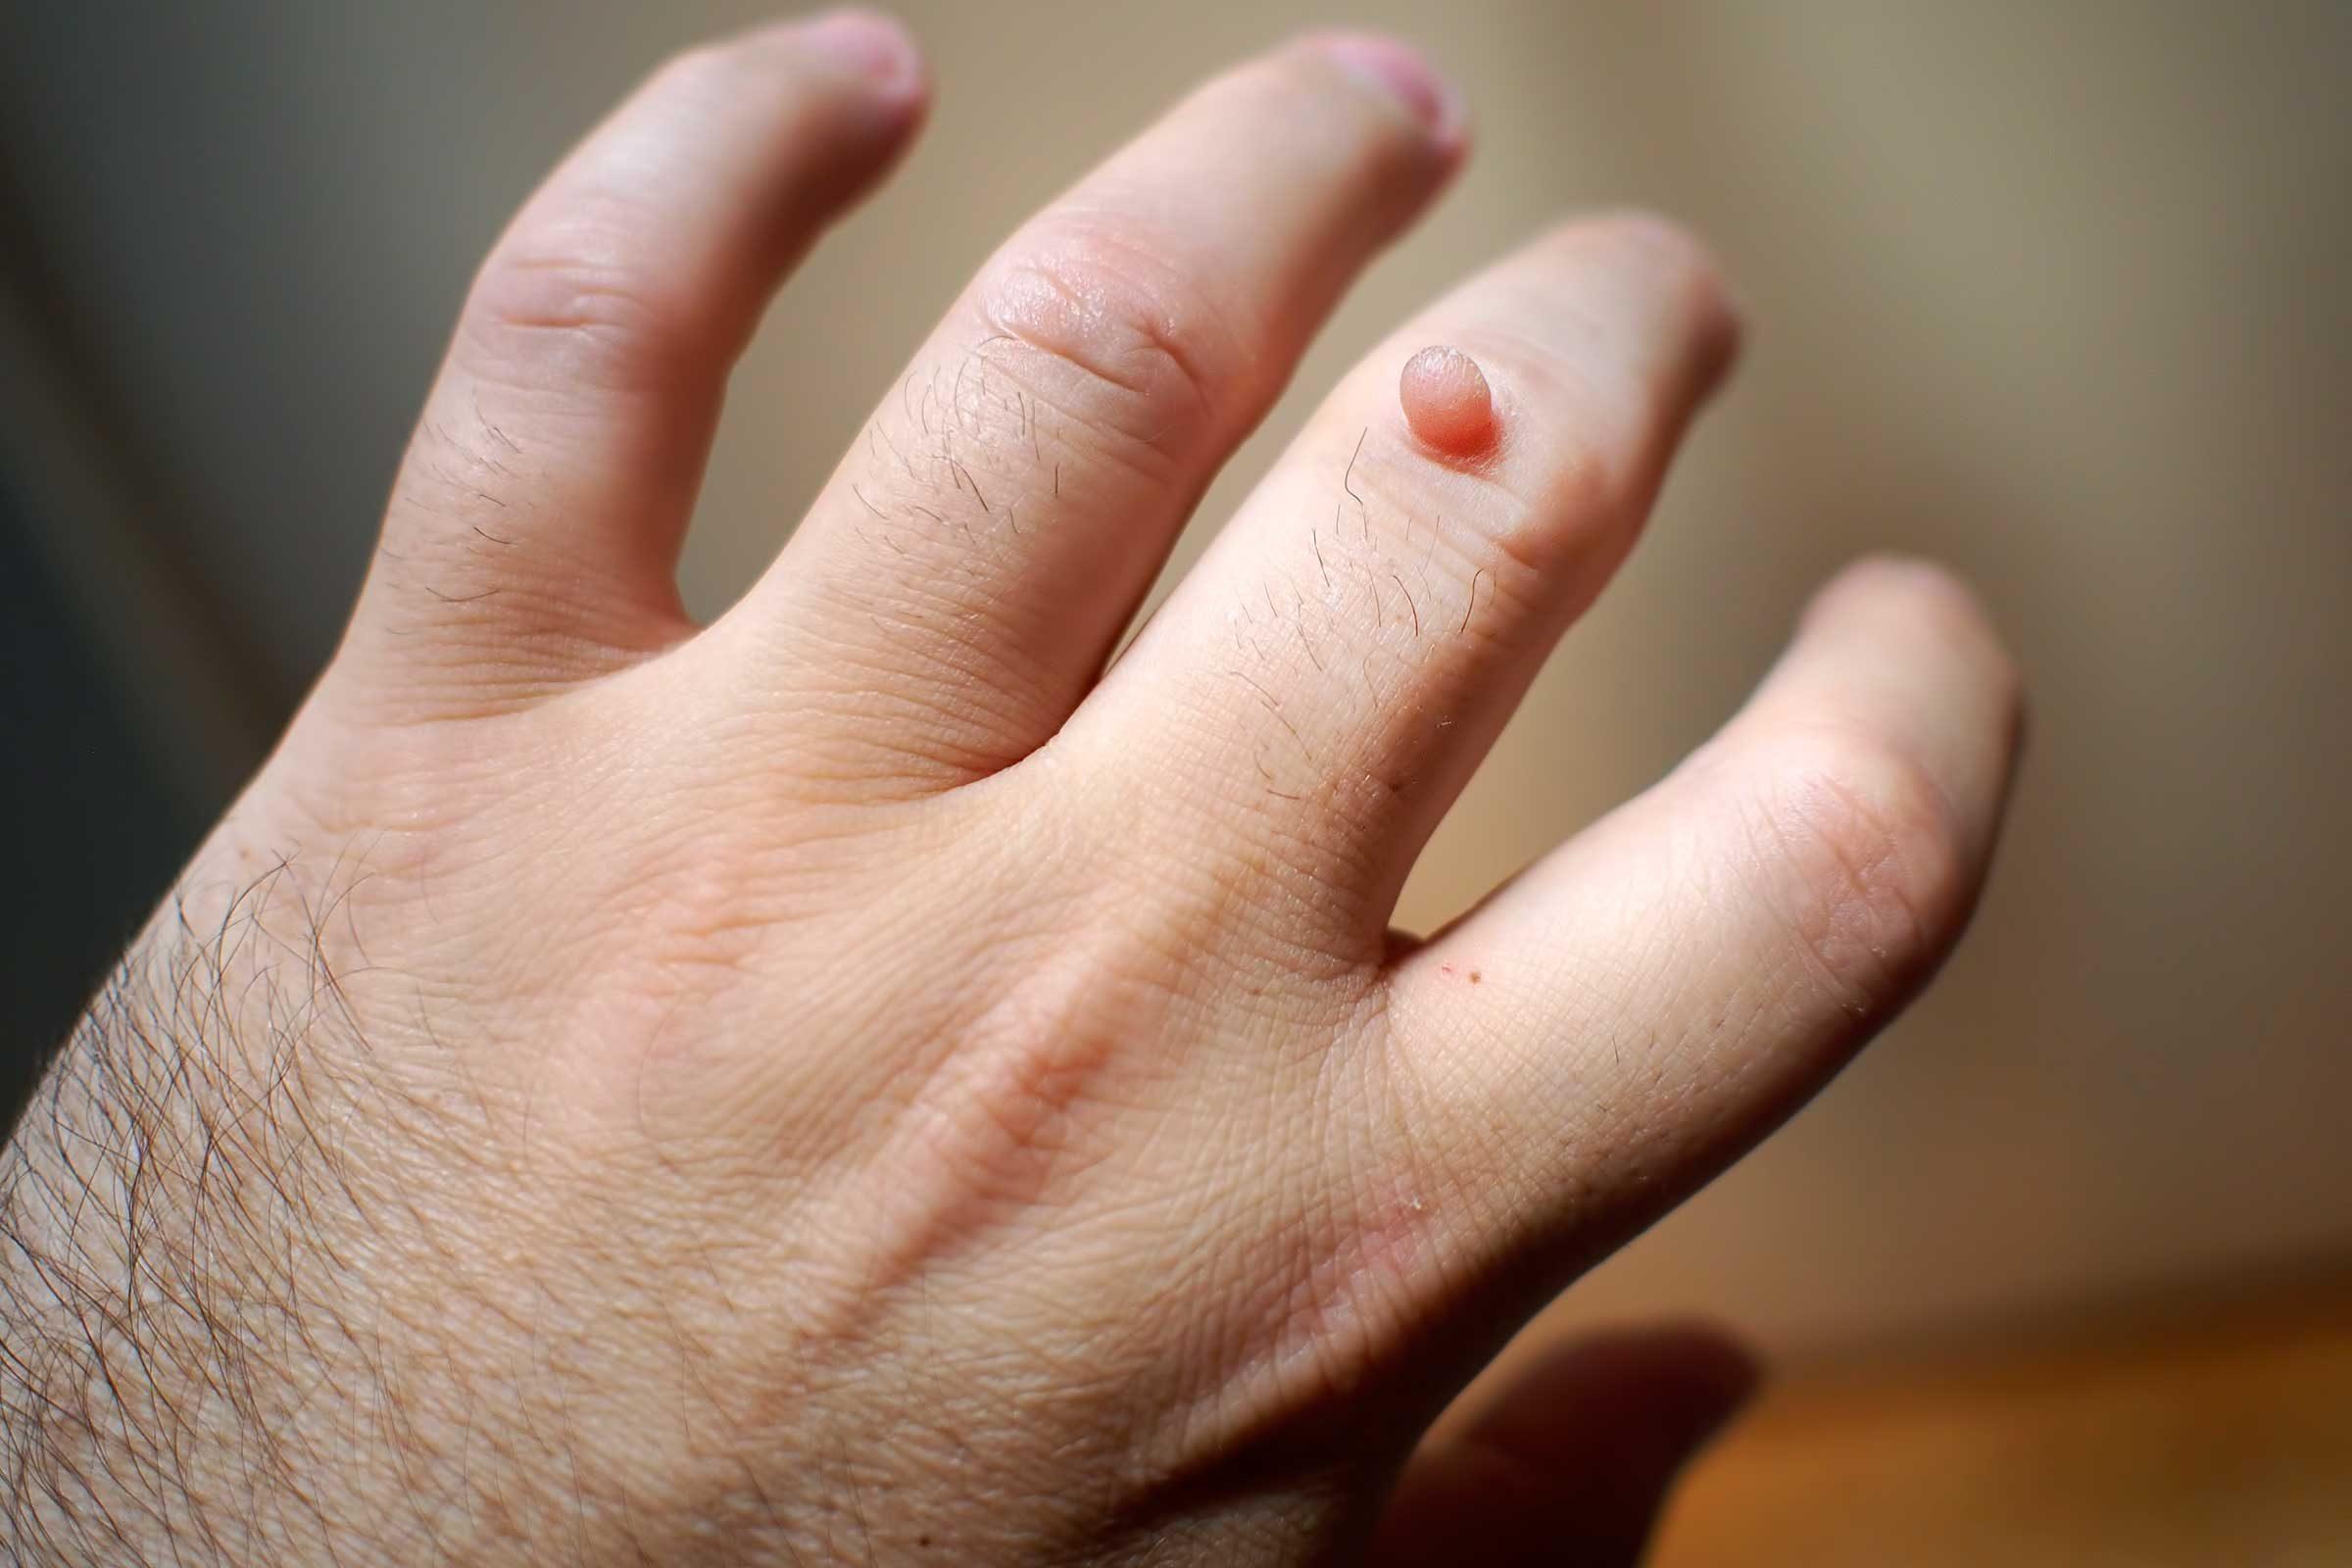 warts on human skin)